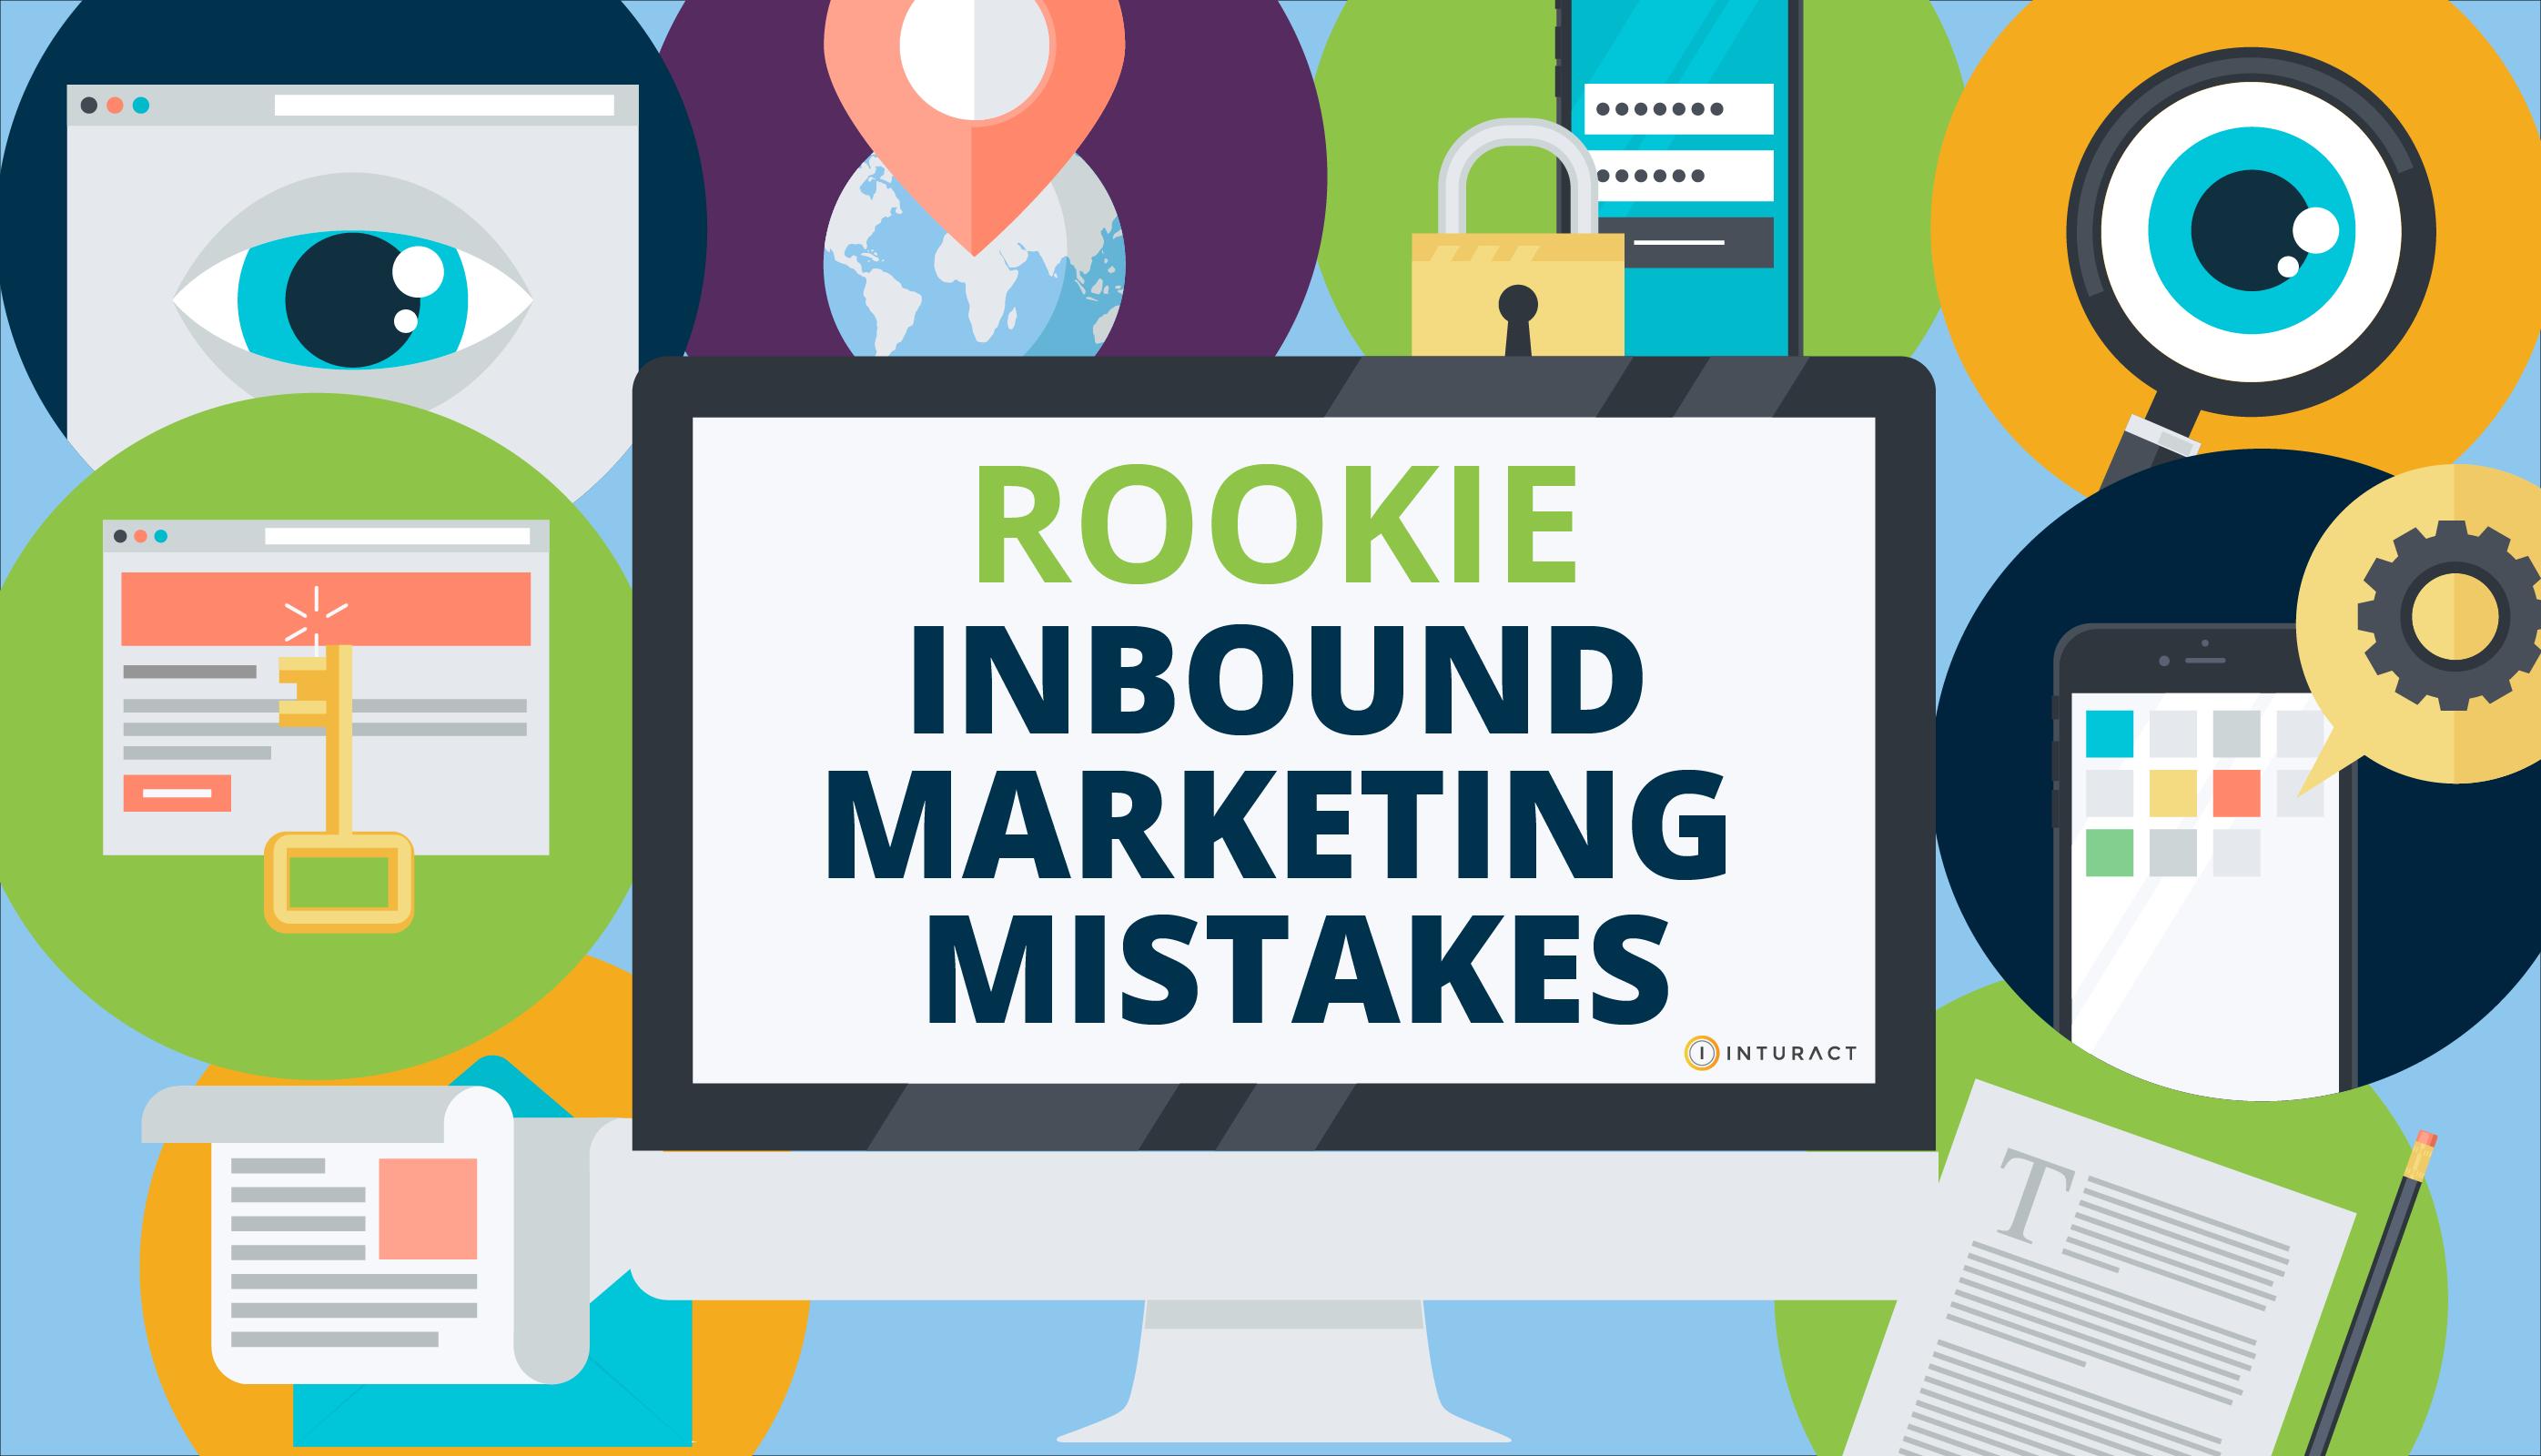 Don't Make These Rookie Inbound Marketing Mistakes